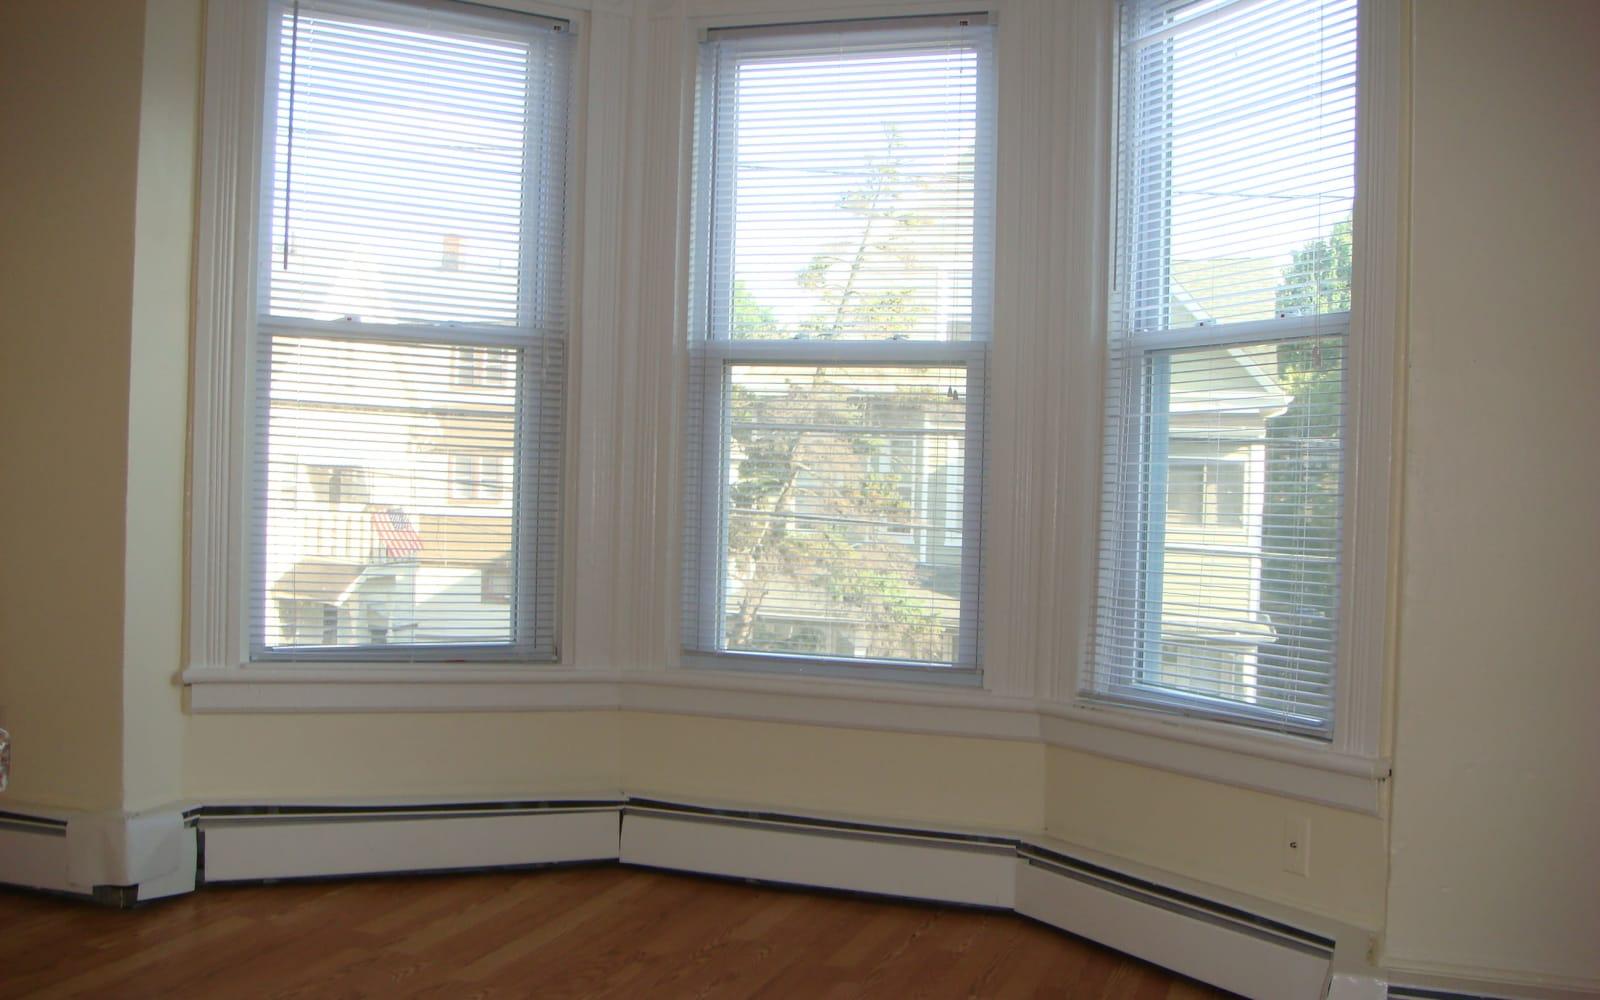 Bay window in apartment at 400 Atlantic in Bridgeport, Connecticut